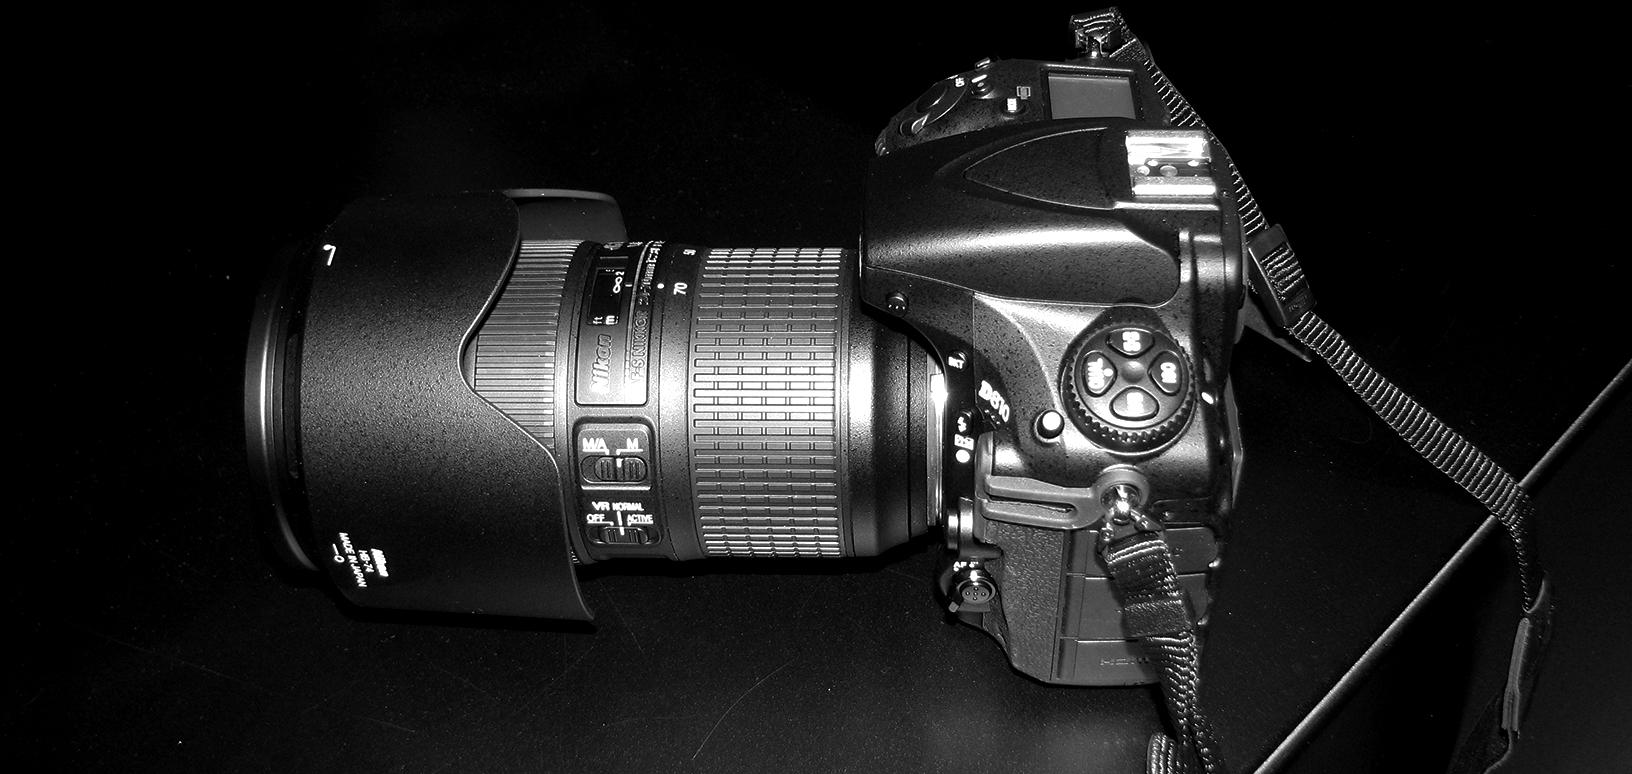 macchina fotografica Nikon 810